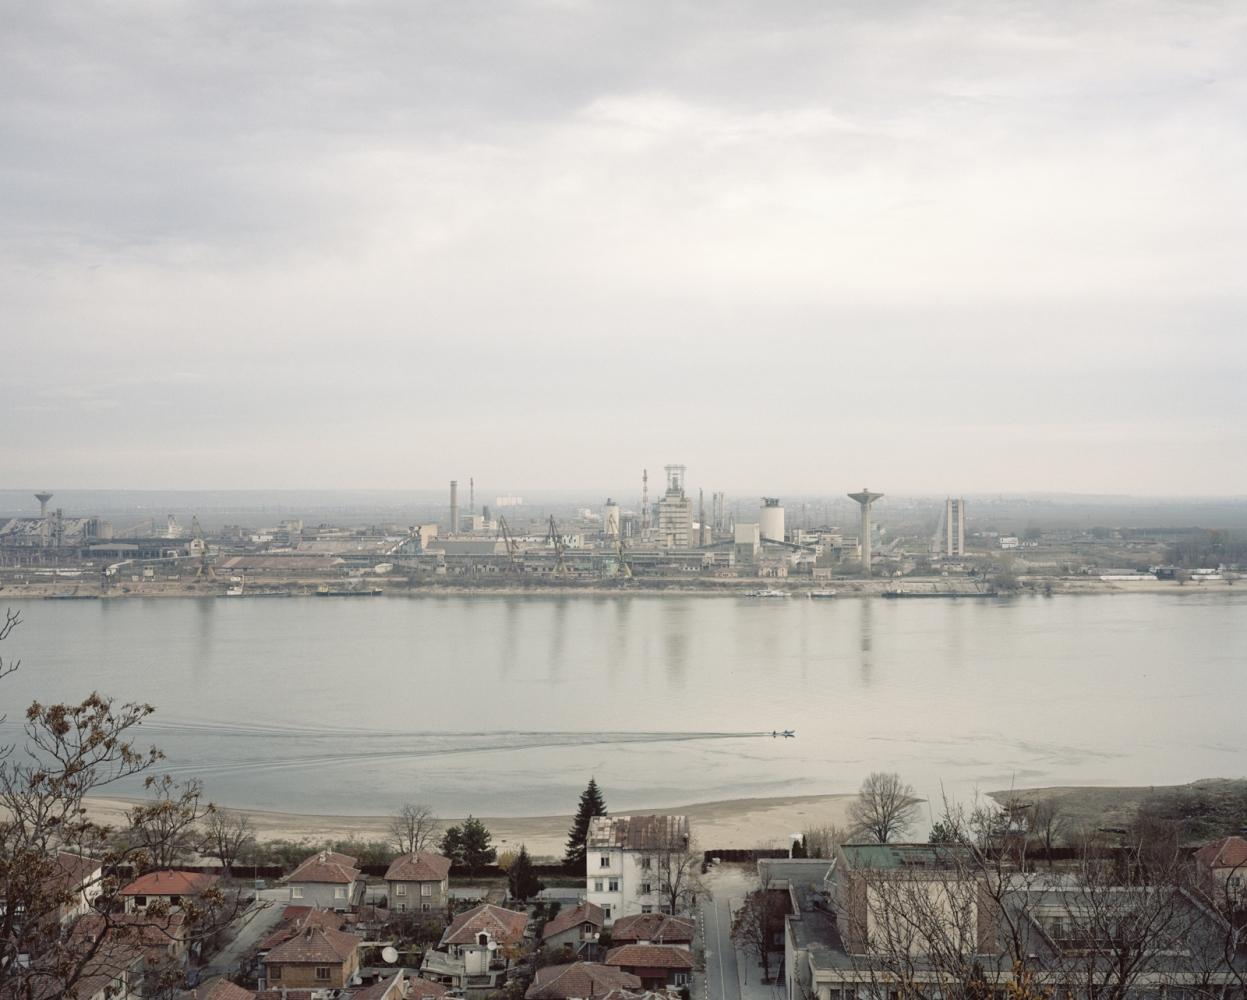 Bulgaria, Nikopol. A view of Turno Magurele industrial area. Turno Magurele industries caused a massive pollution of the area.